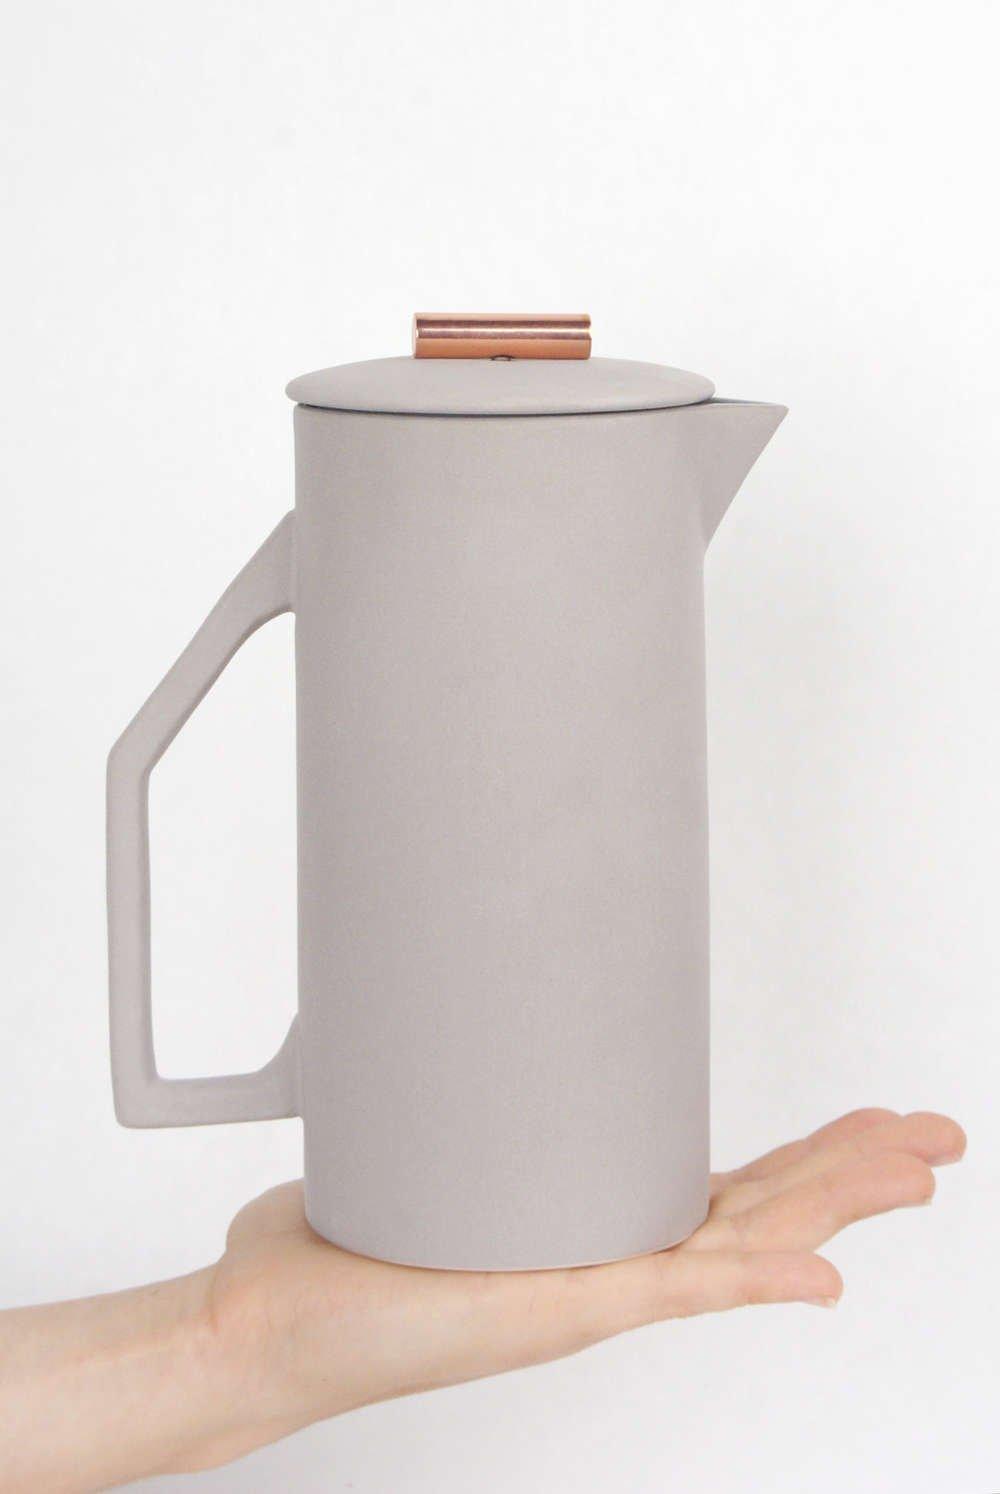 Handmade Ceramic Yield Design French Press Coffee Maker